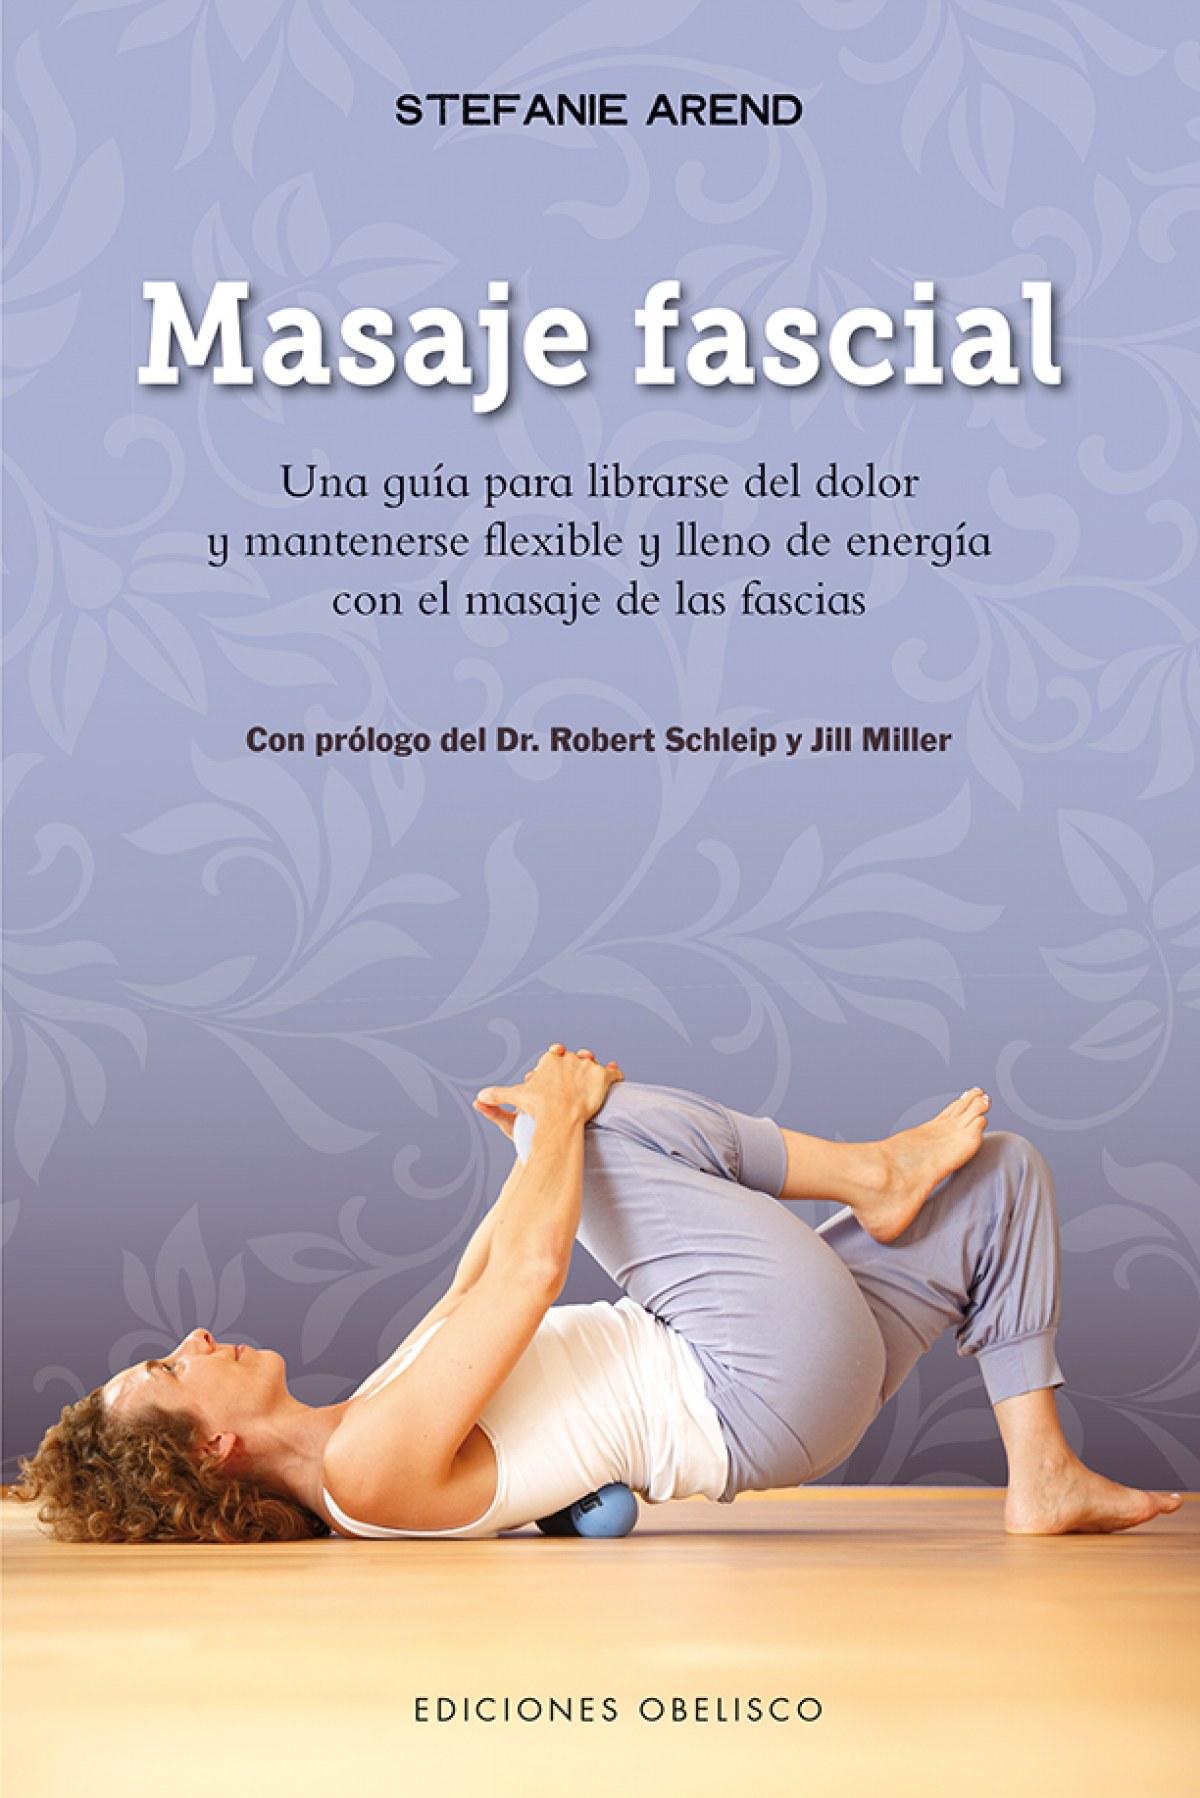 MASAJE FASCIAL